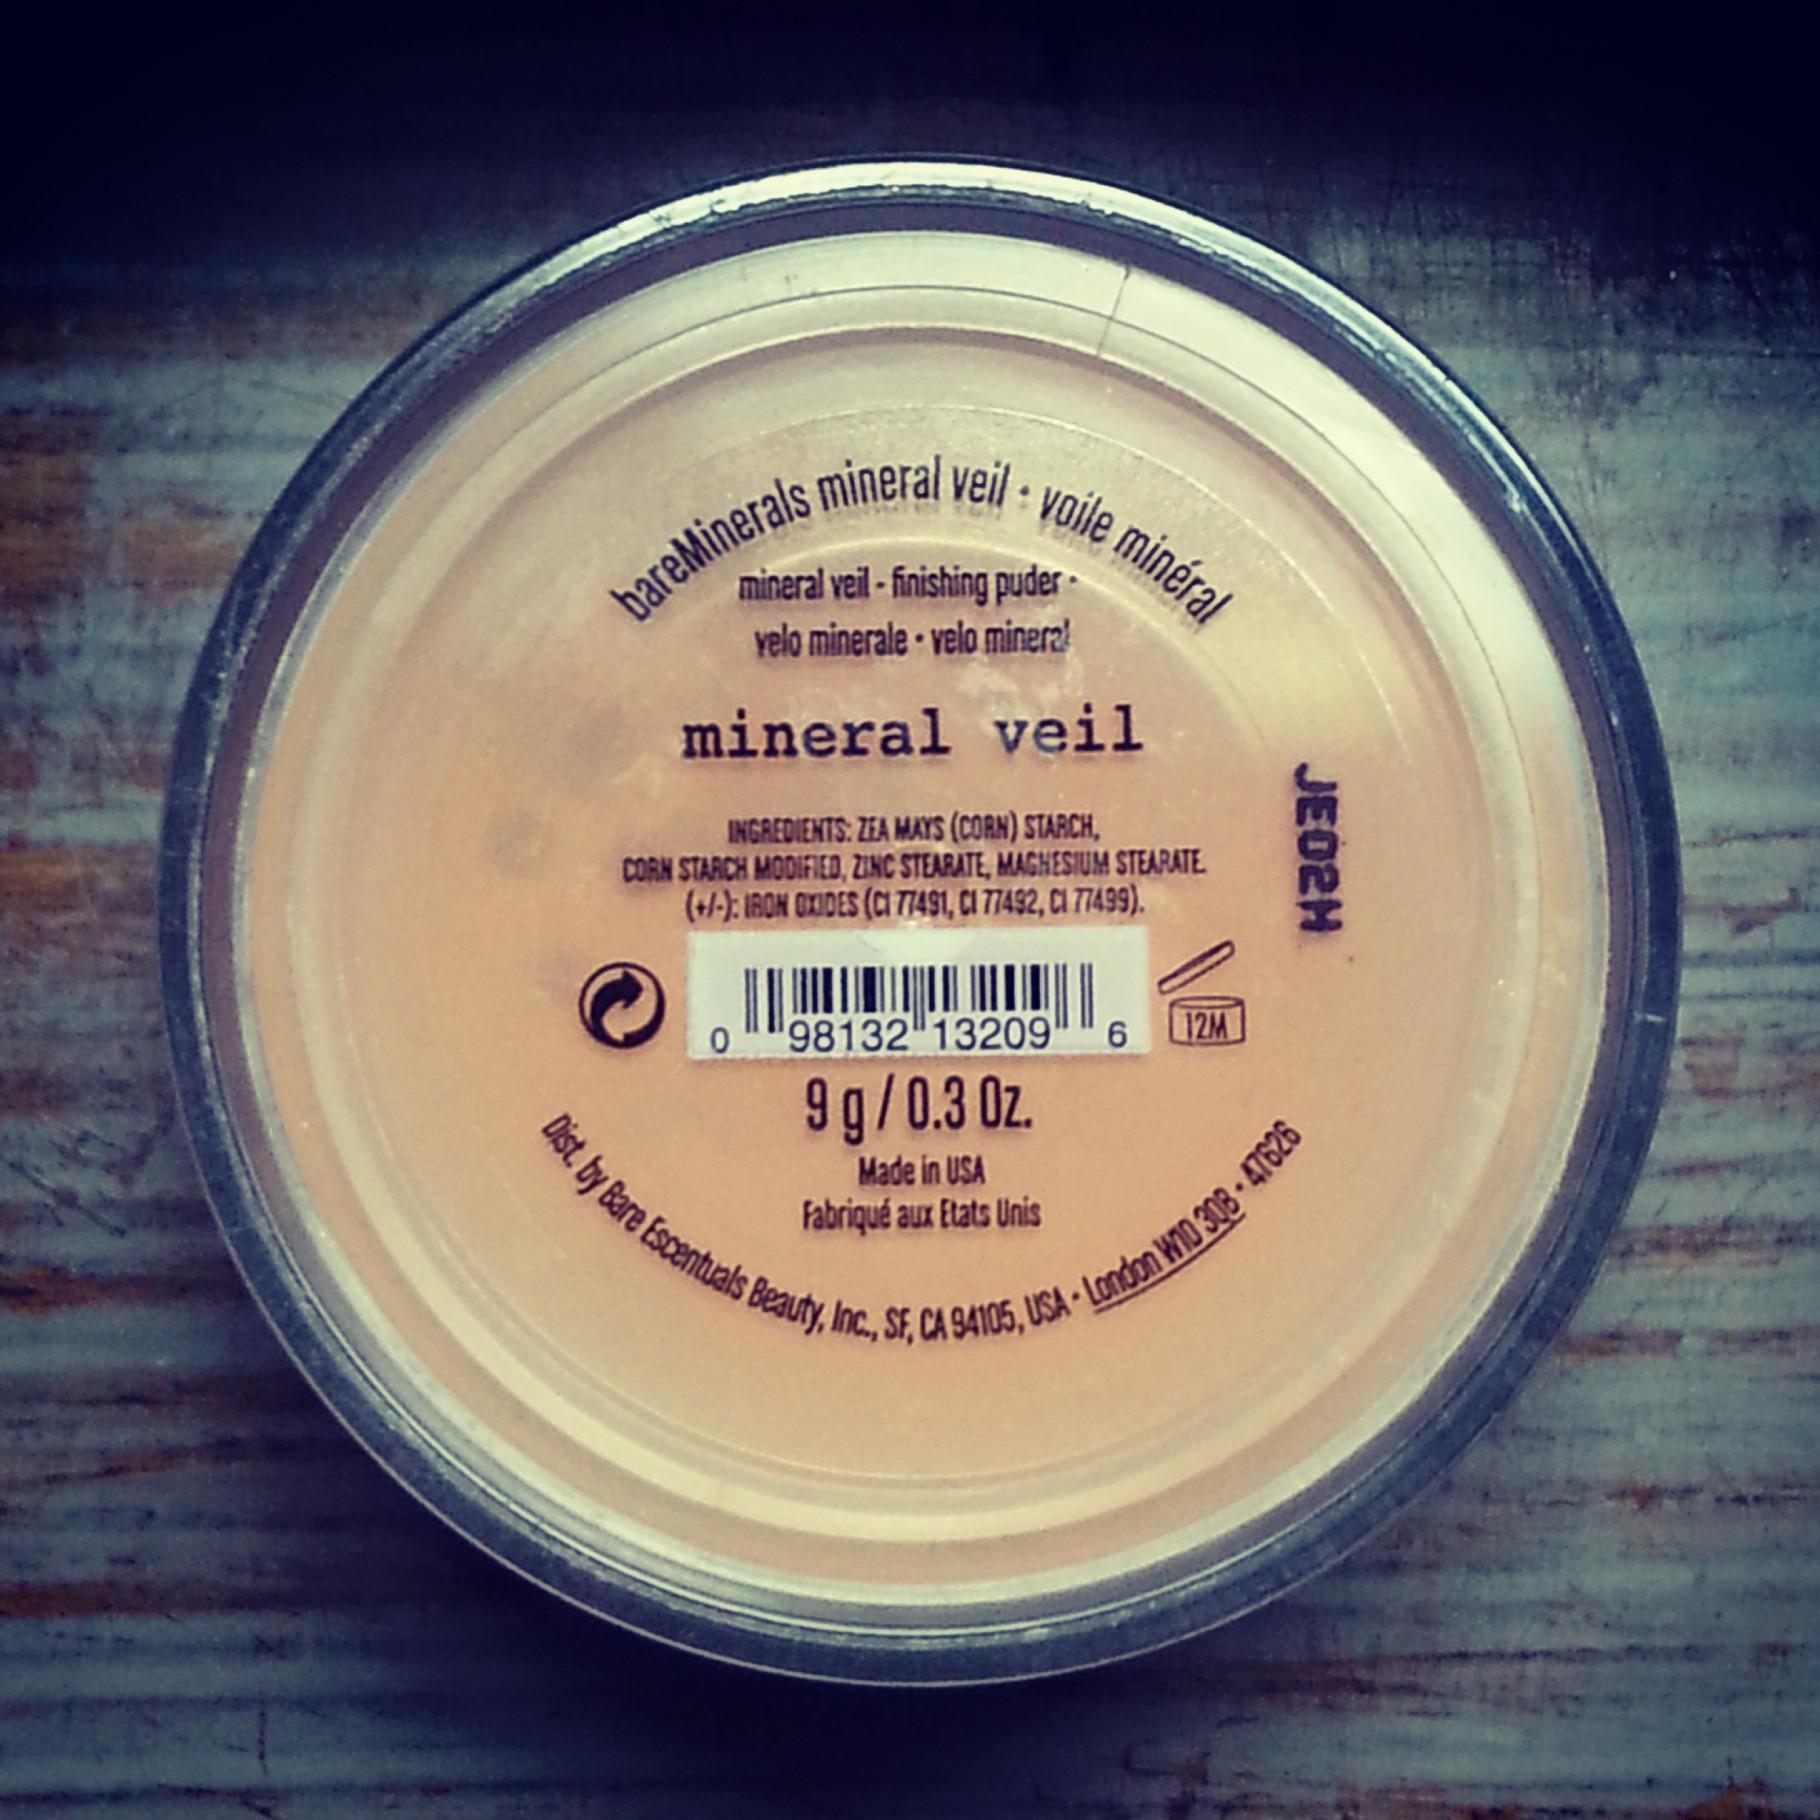 BareMinerals - Mineral Veil